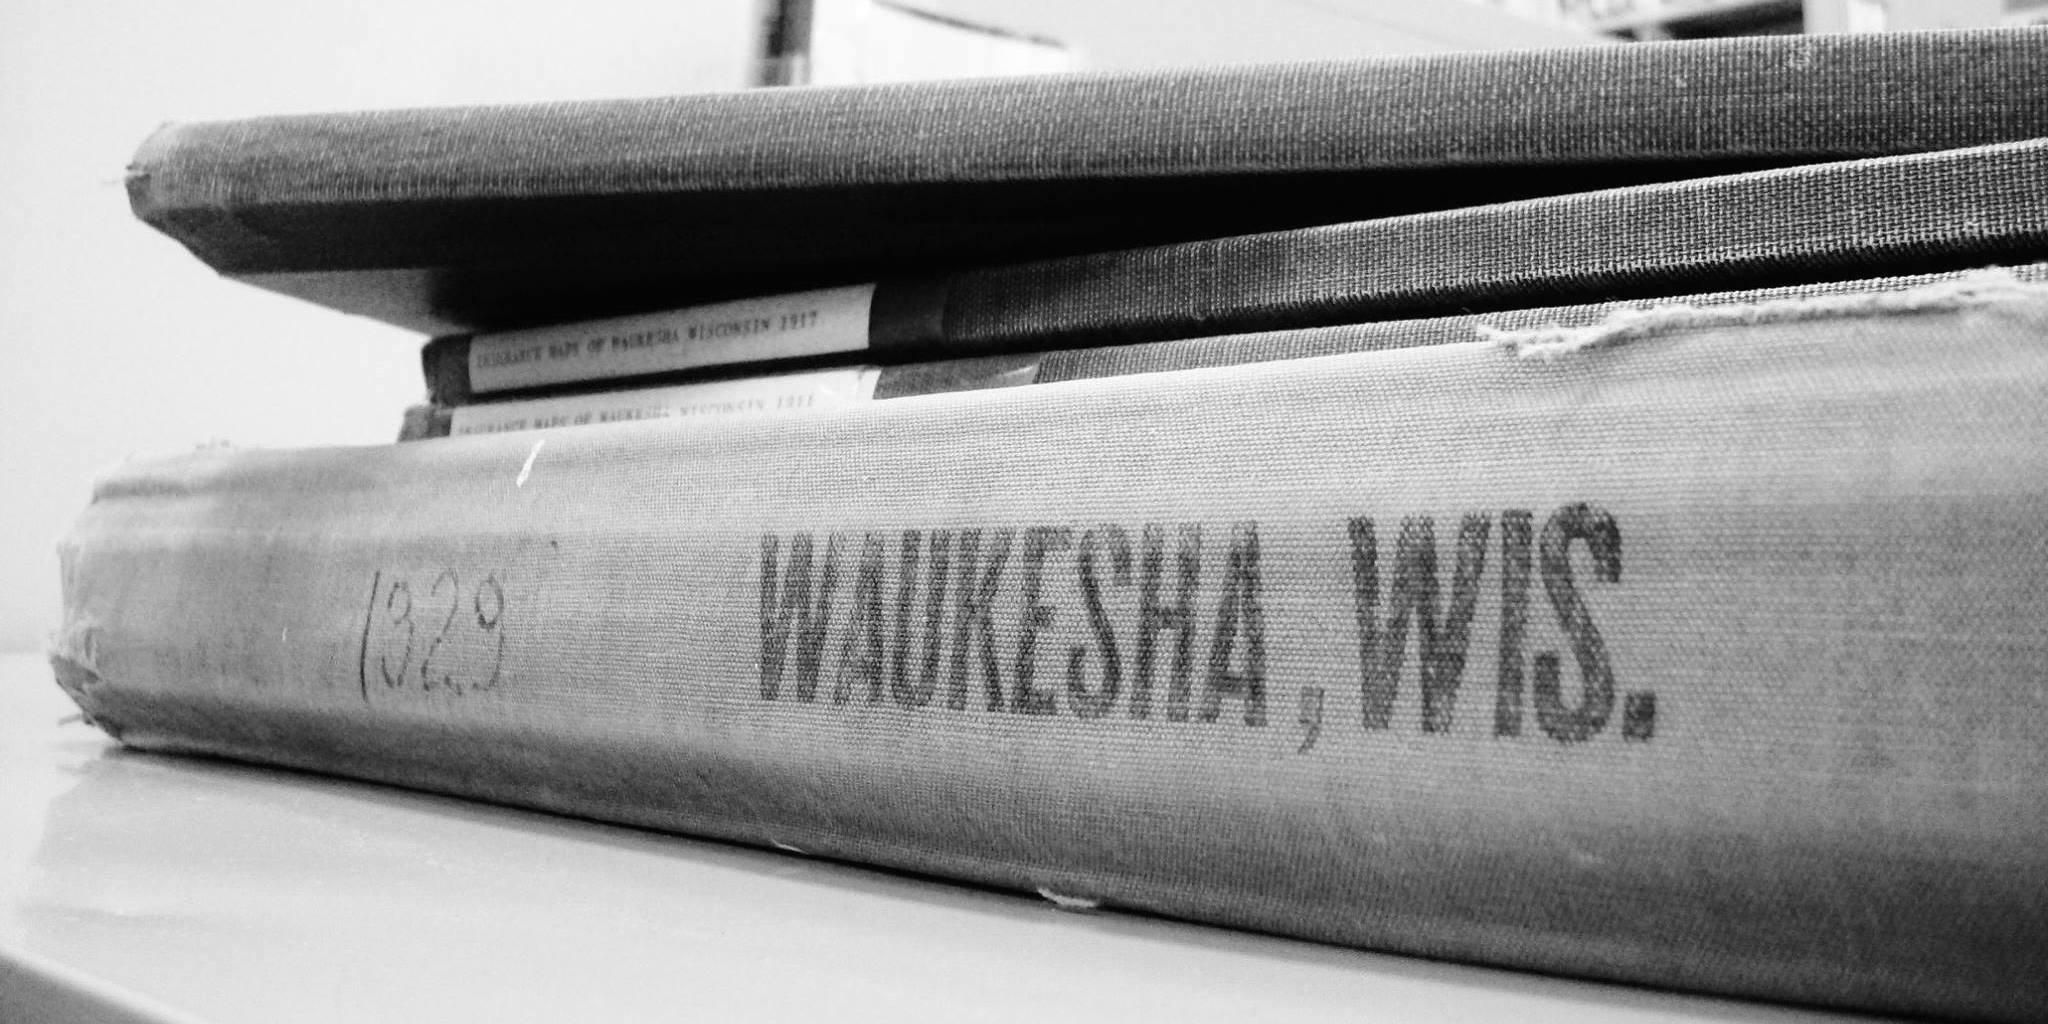 Photo of historical books at Waukesha Public Library